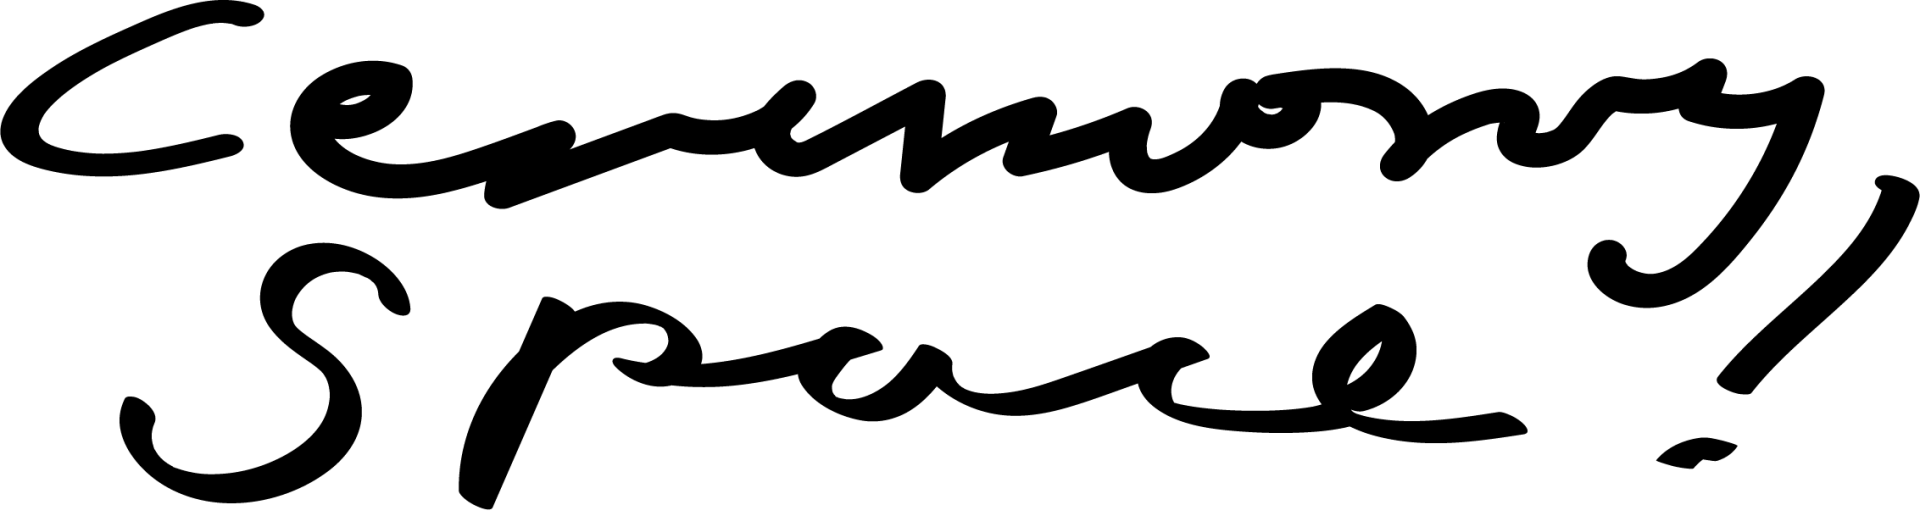 13. – 29.4.2018 Programm